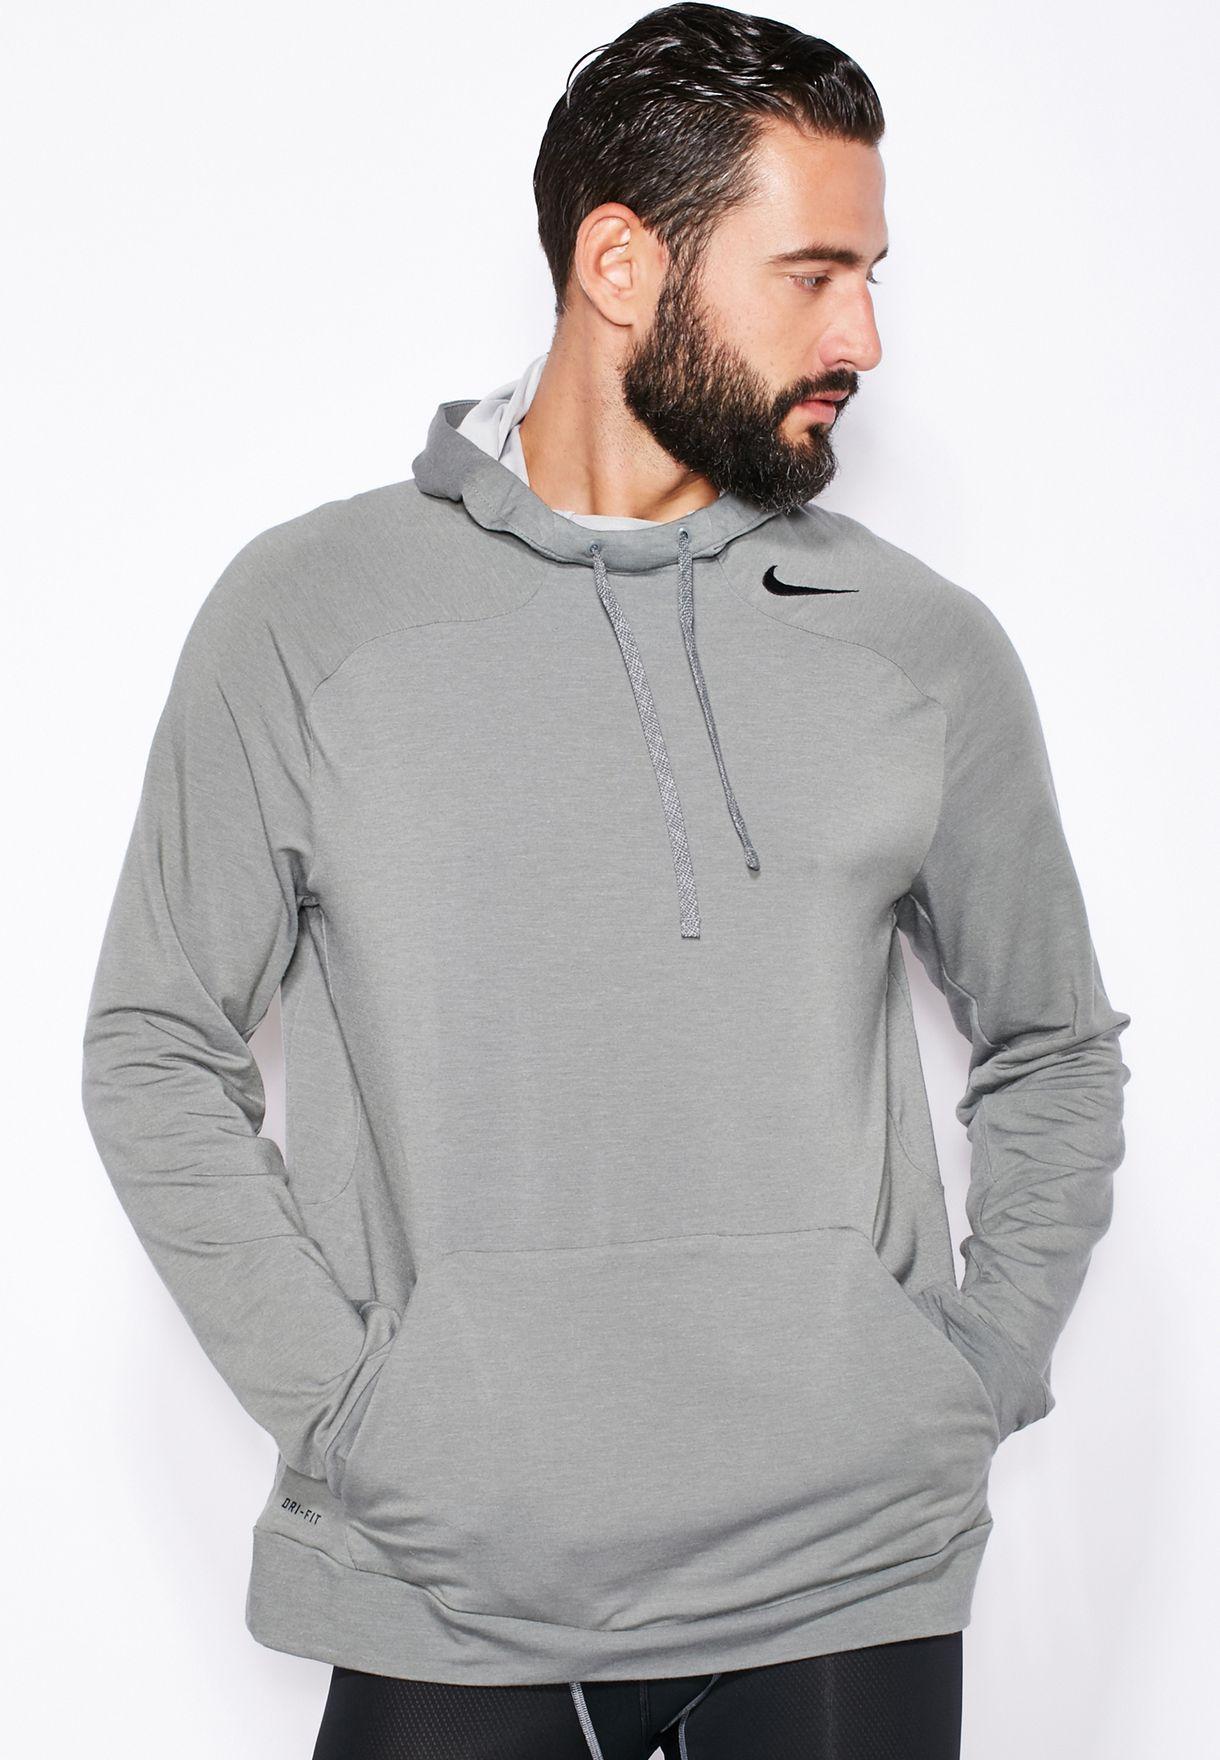 b12b46f7b Shop Nike grey Dri-Fit Touch Fleece Hoodie 728448-037 for Men in ...